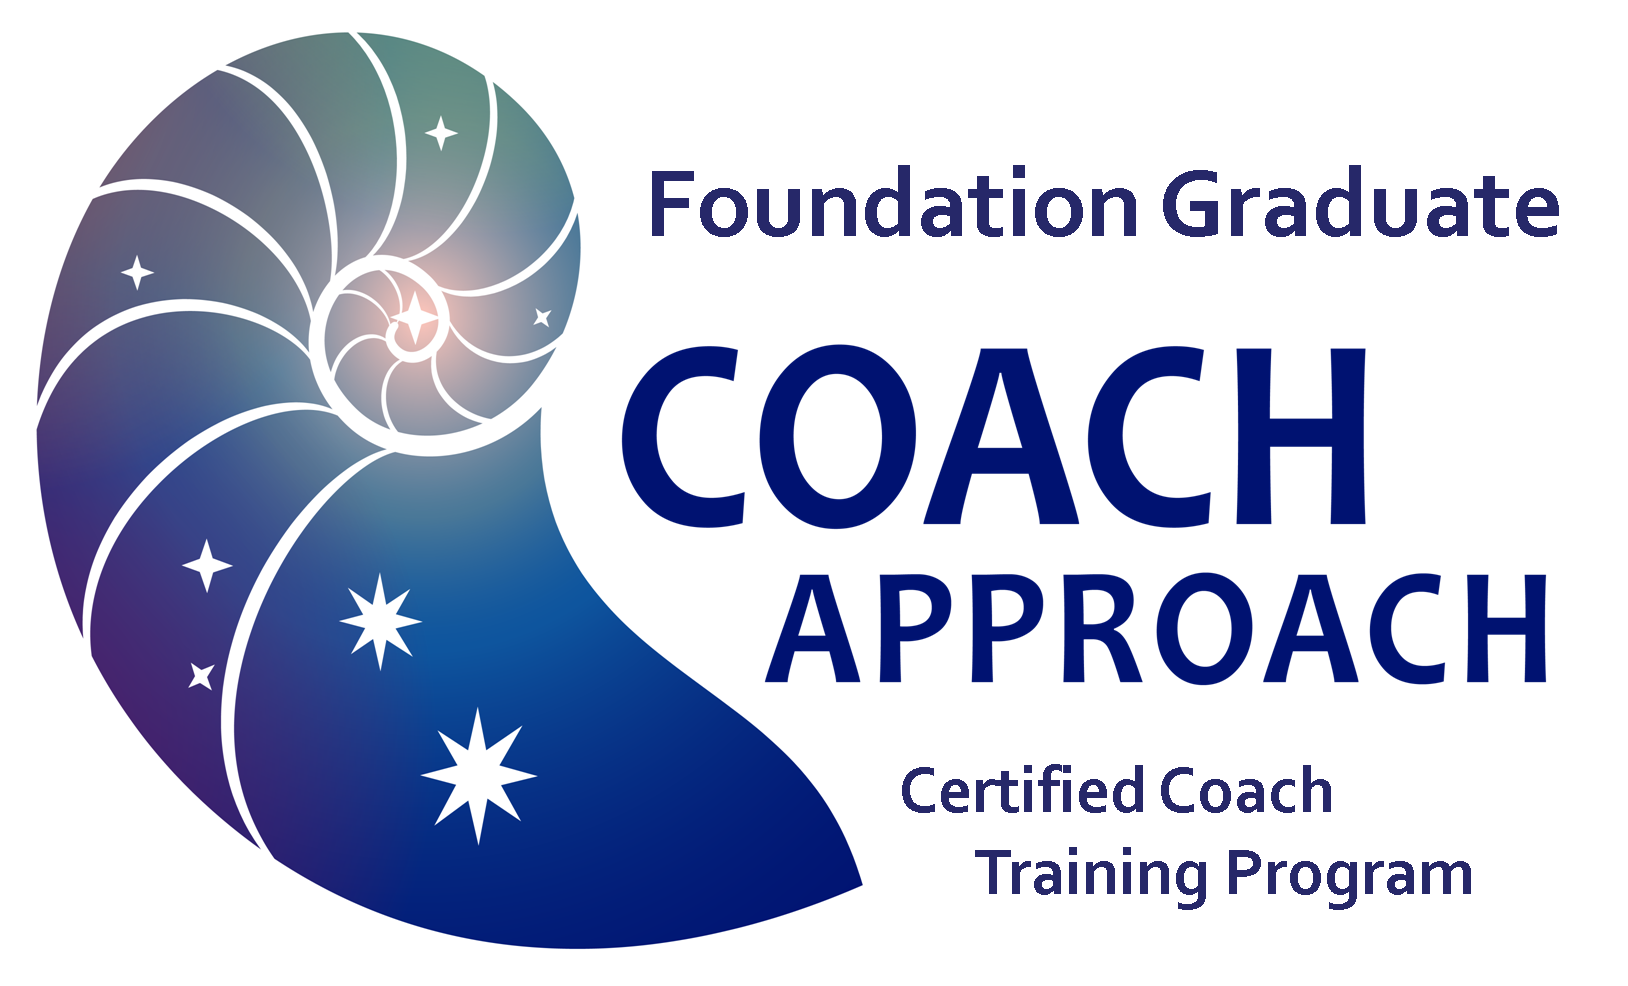 Foundation Coach Approach